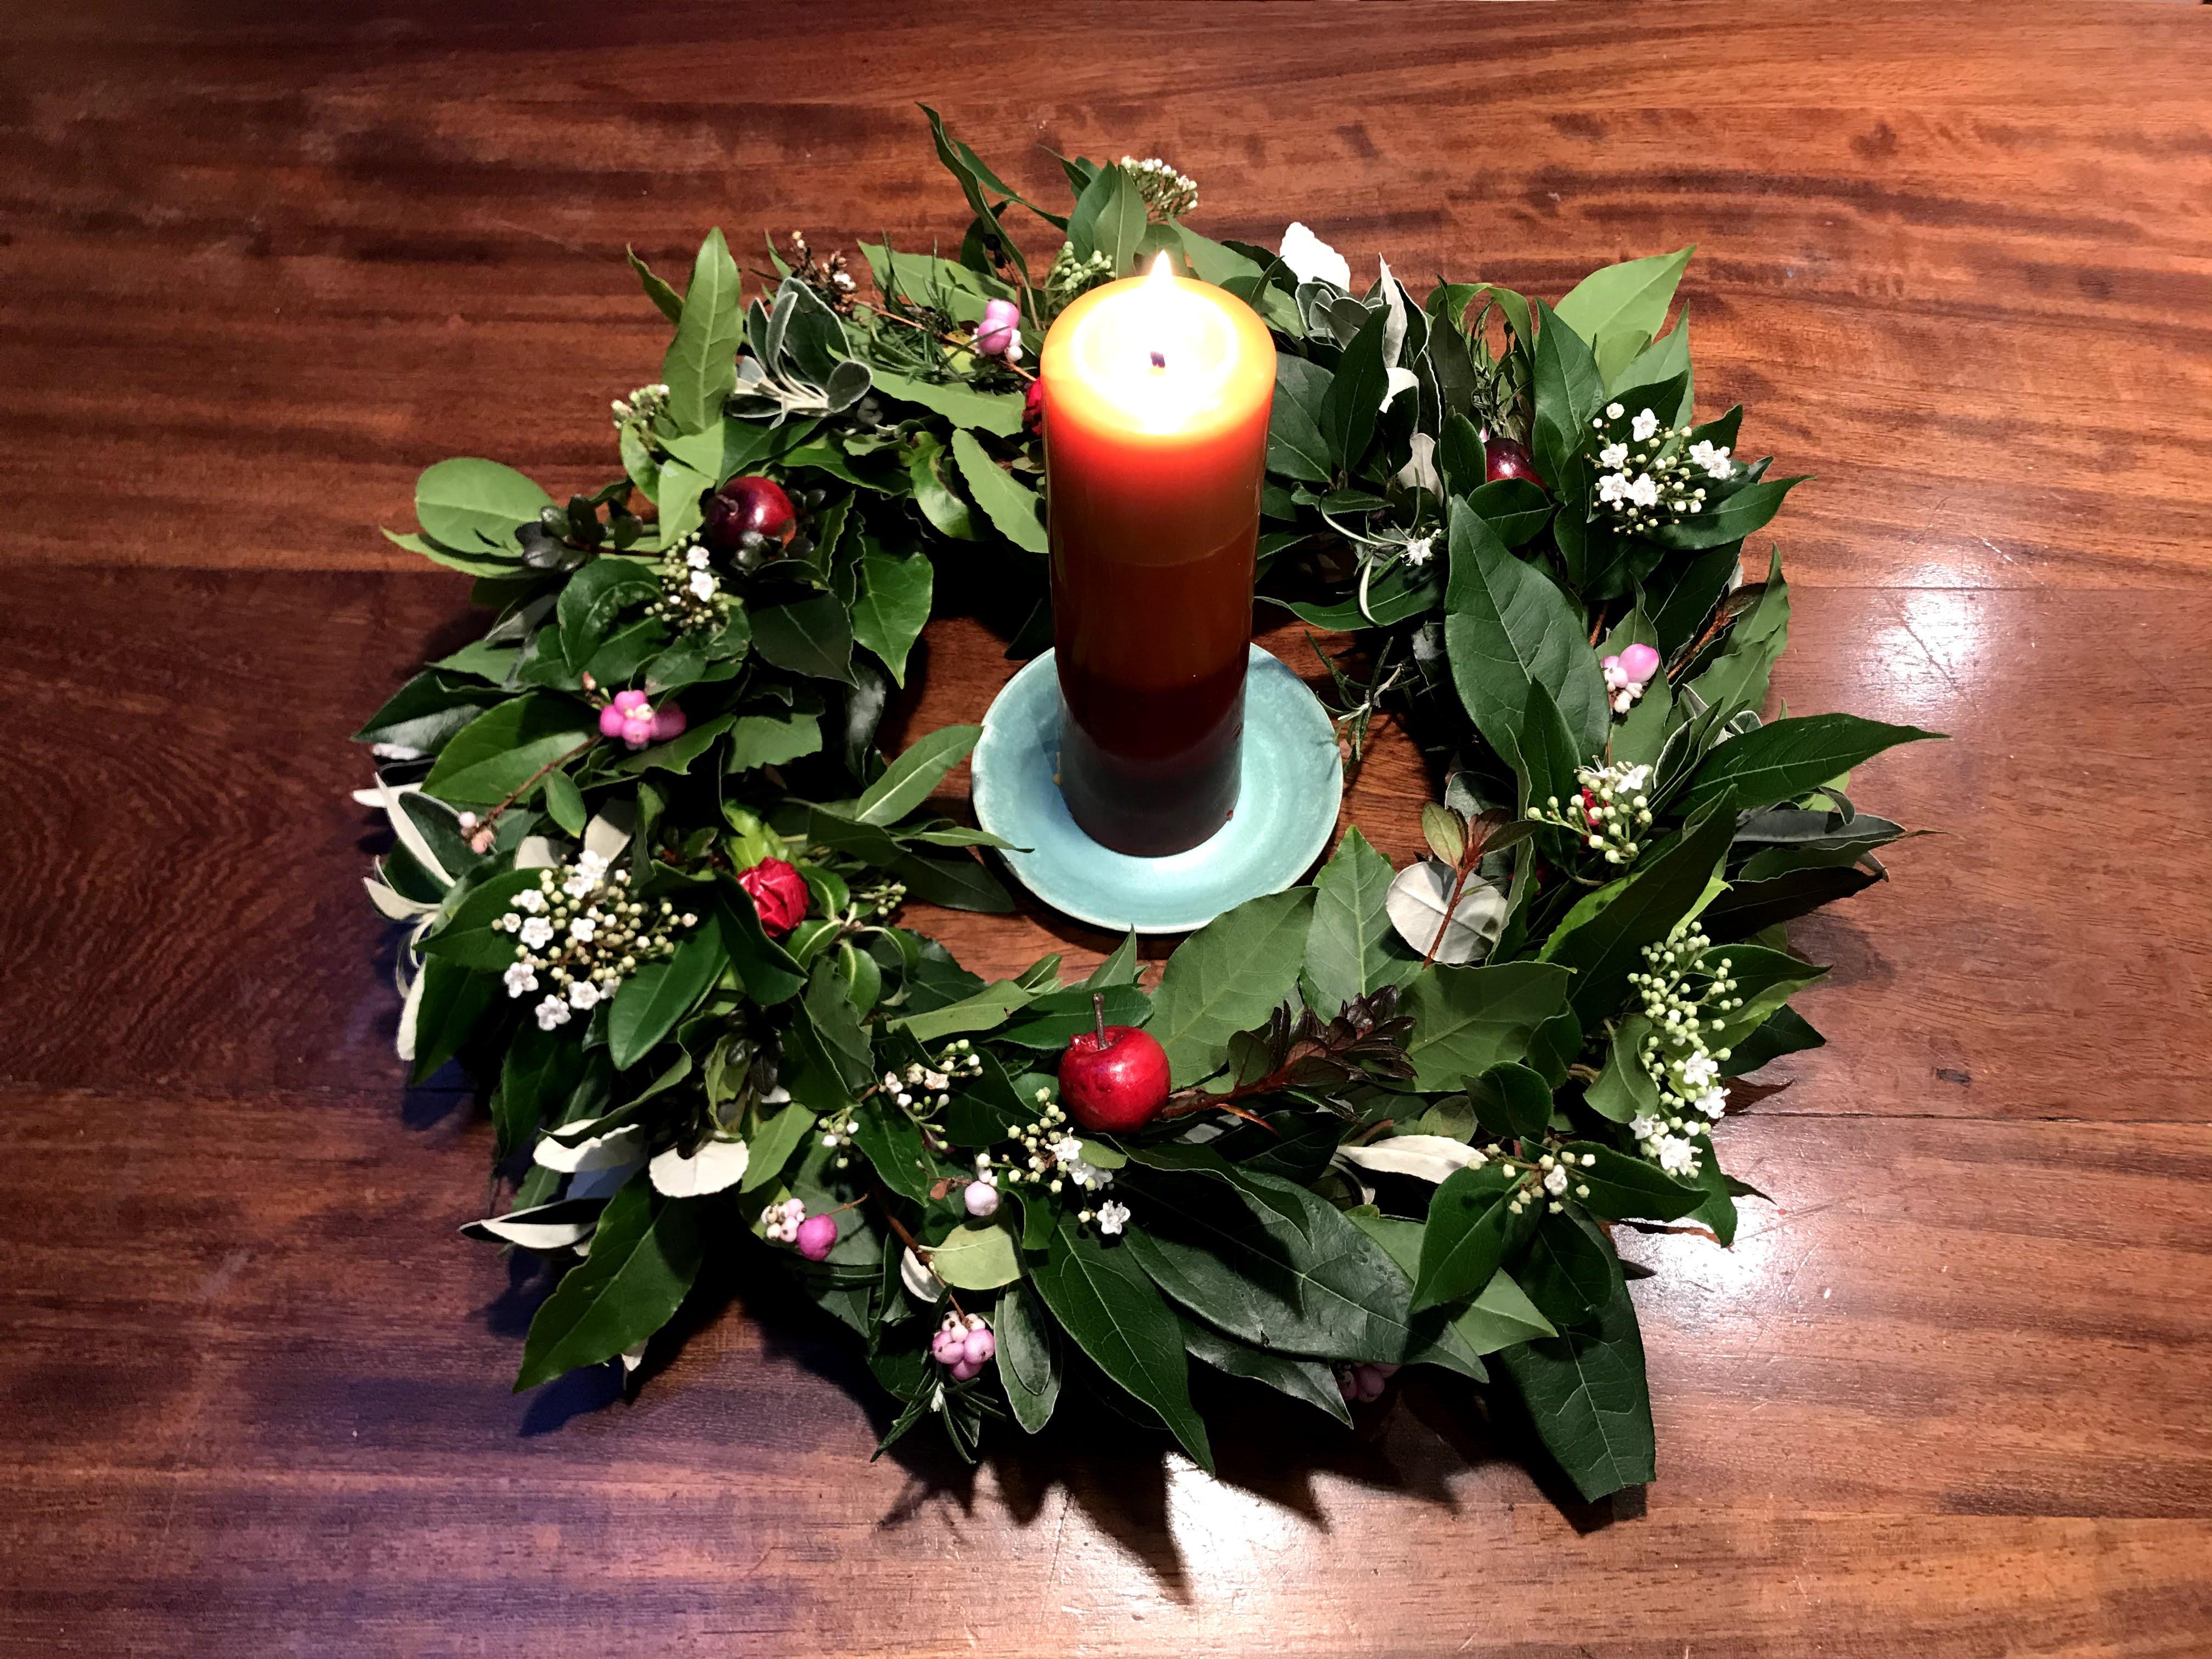 Christmas Wreath Making workshop mentored by Annabelle  Davis